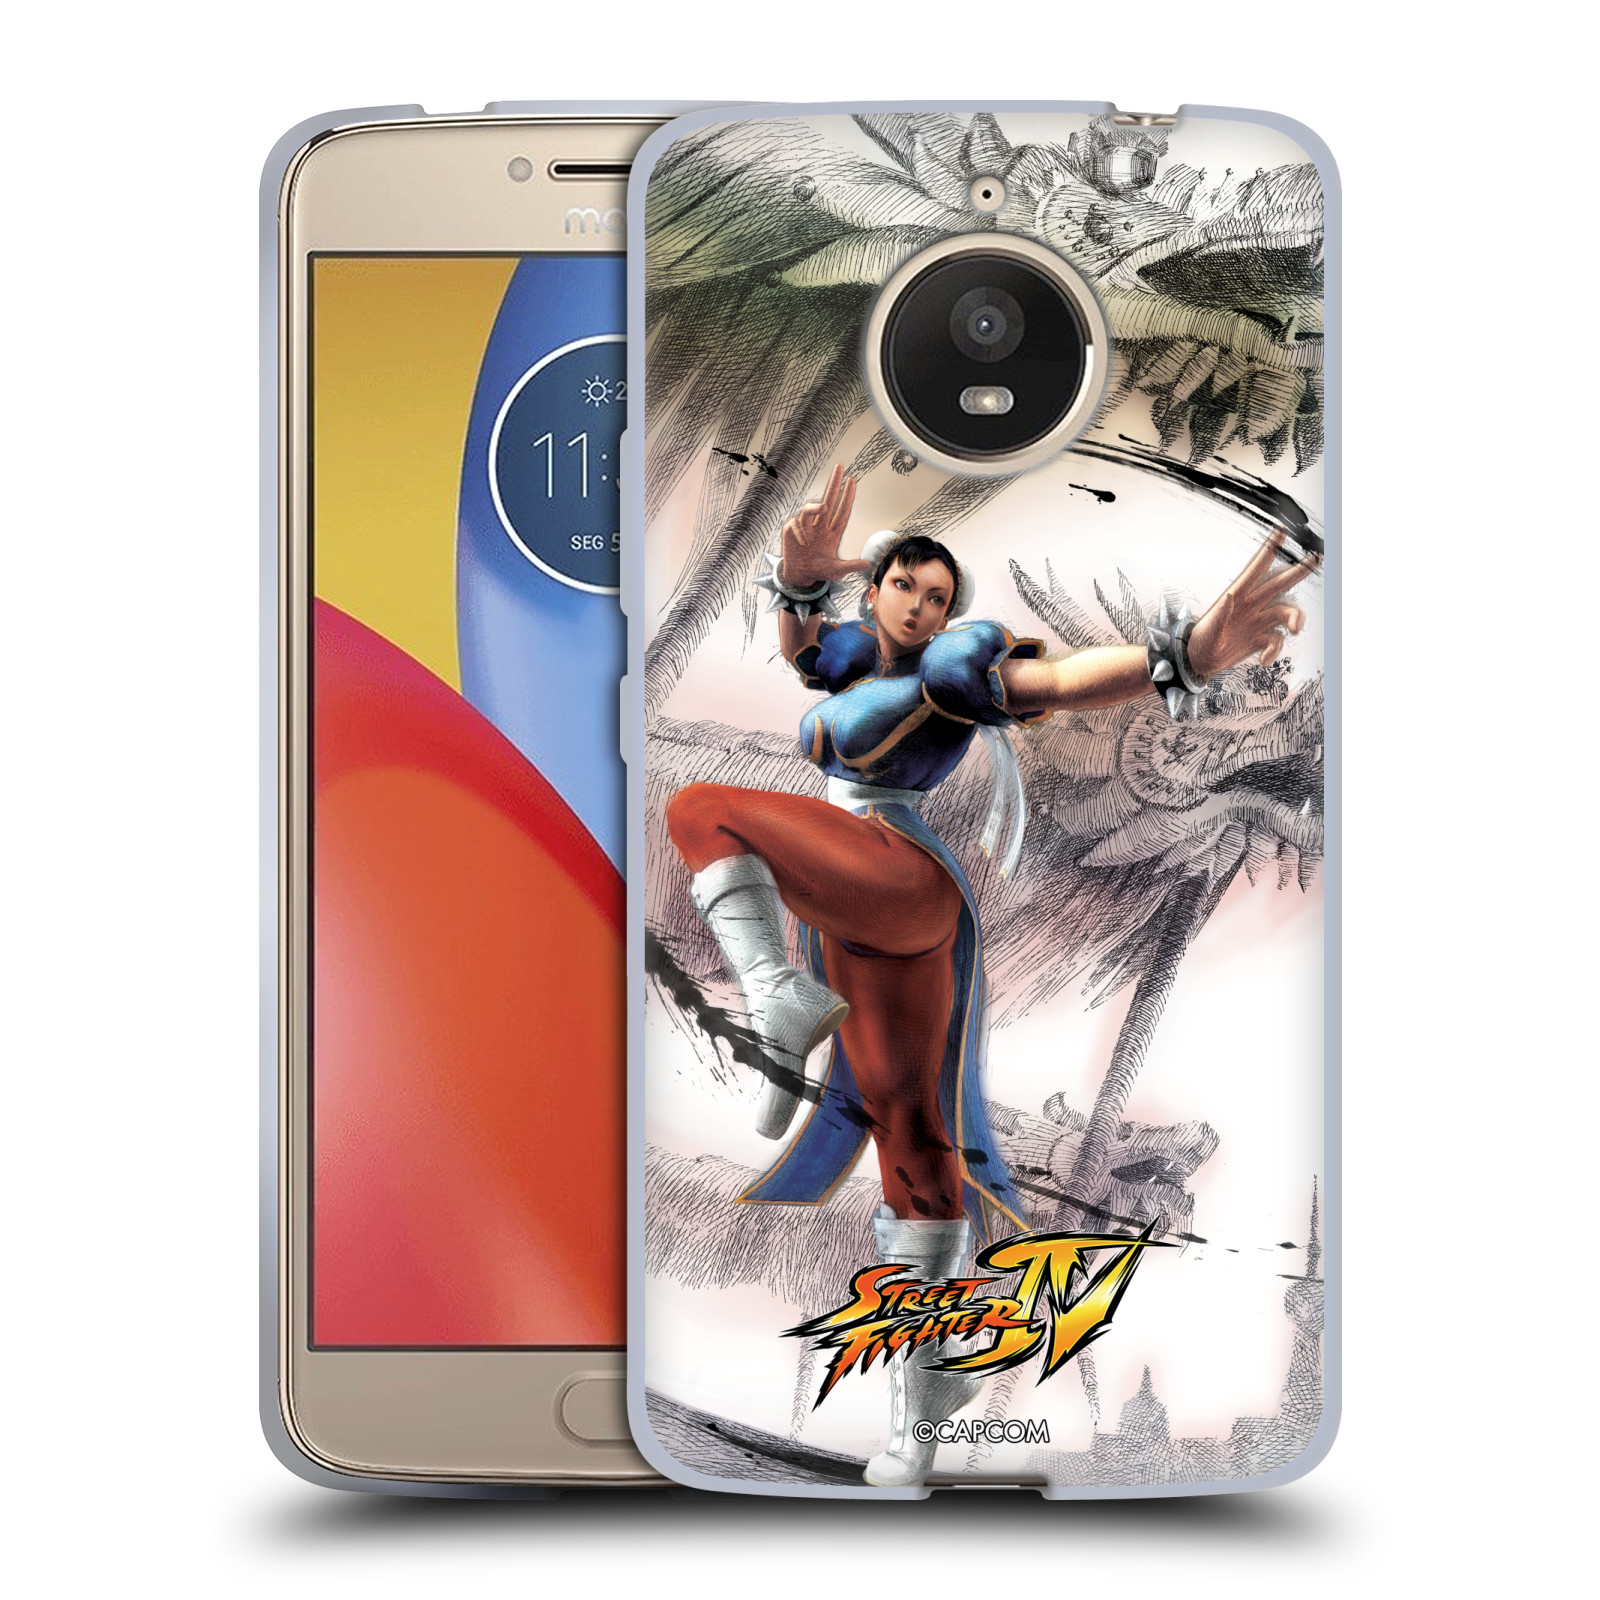 HEAD CASE silikonový obal na mobil Lenovo Moto E4 PLUS oficiální kryt STREET FIGHTER bojovnice Chun-Li kresba